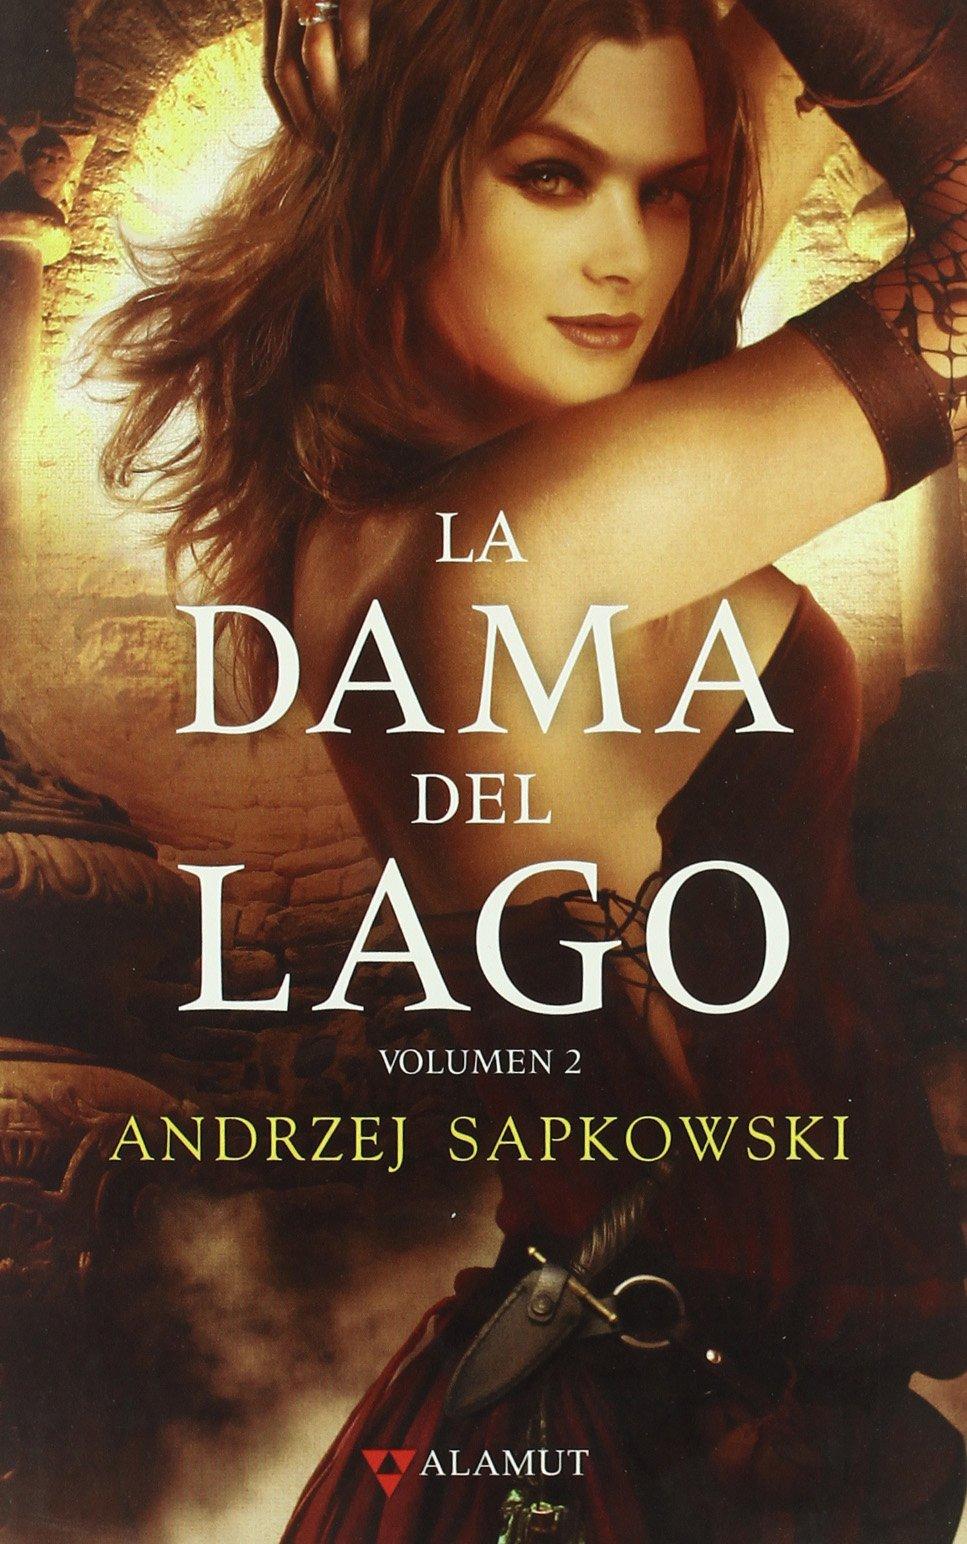 La dama del lago 2 (Alamut Serie Fantástica): Amazon.es: Sapkowski ...